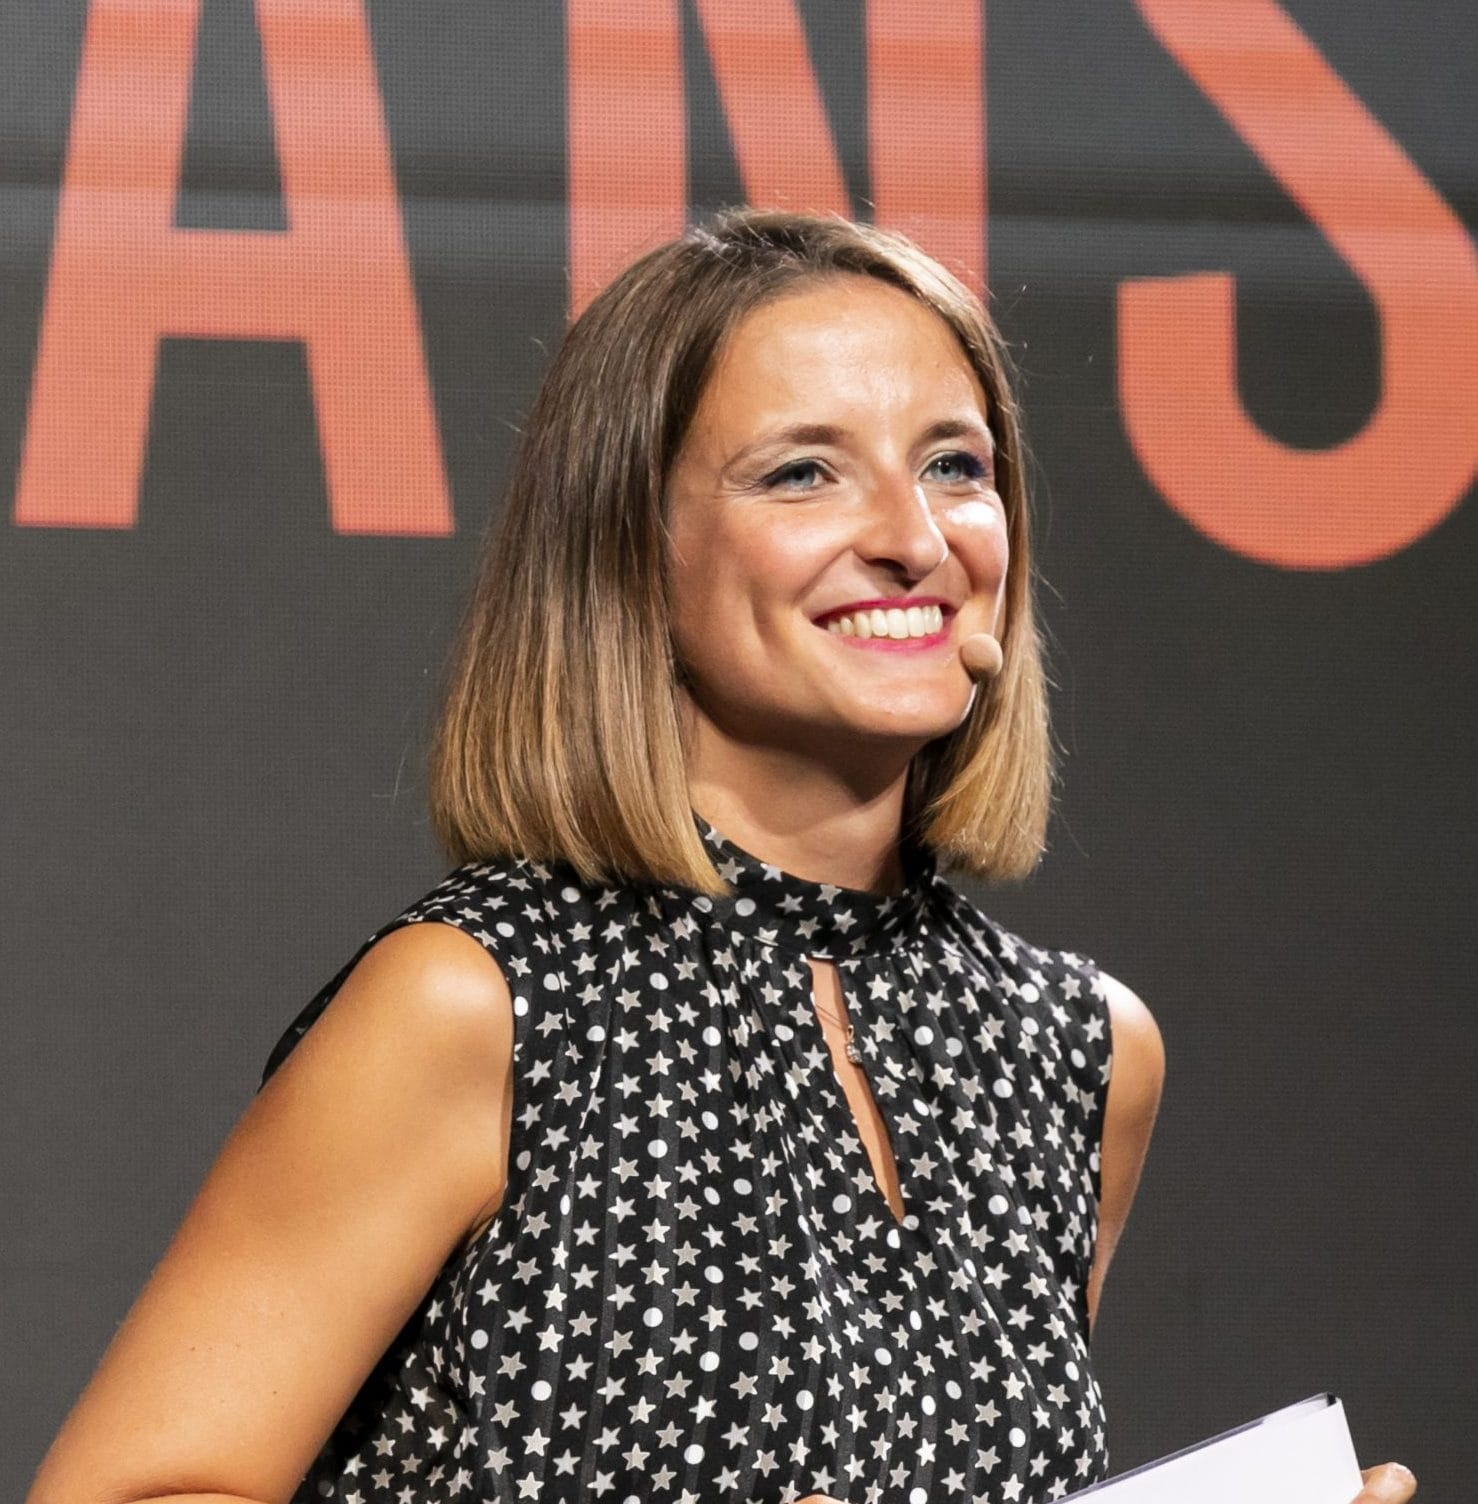 Ilaria Iaquinta